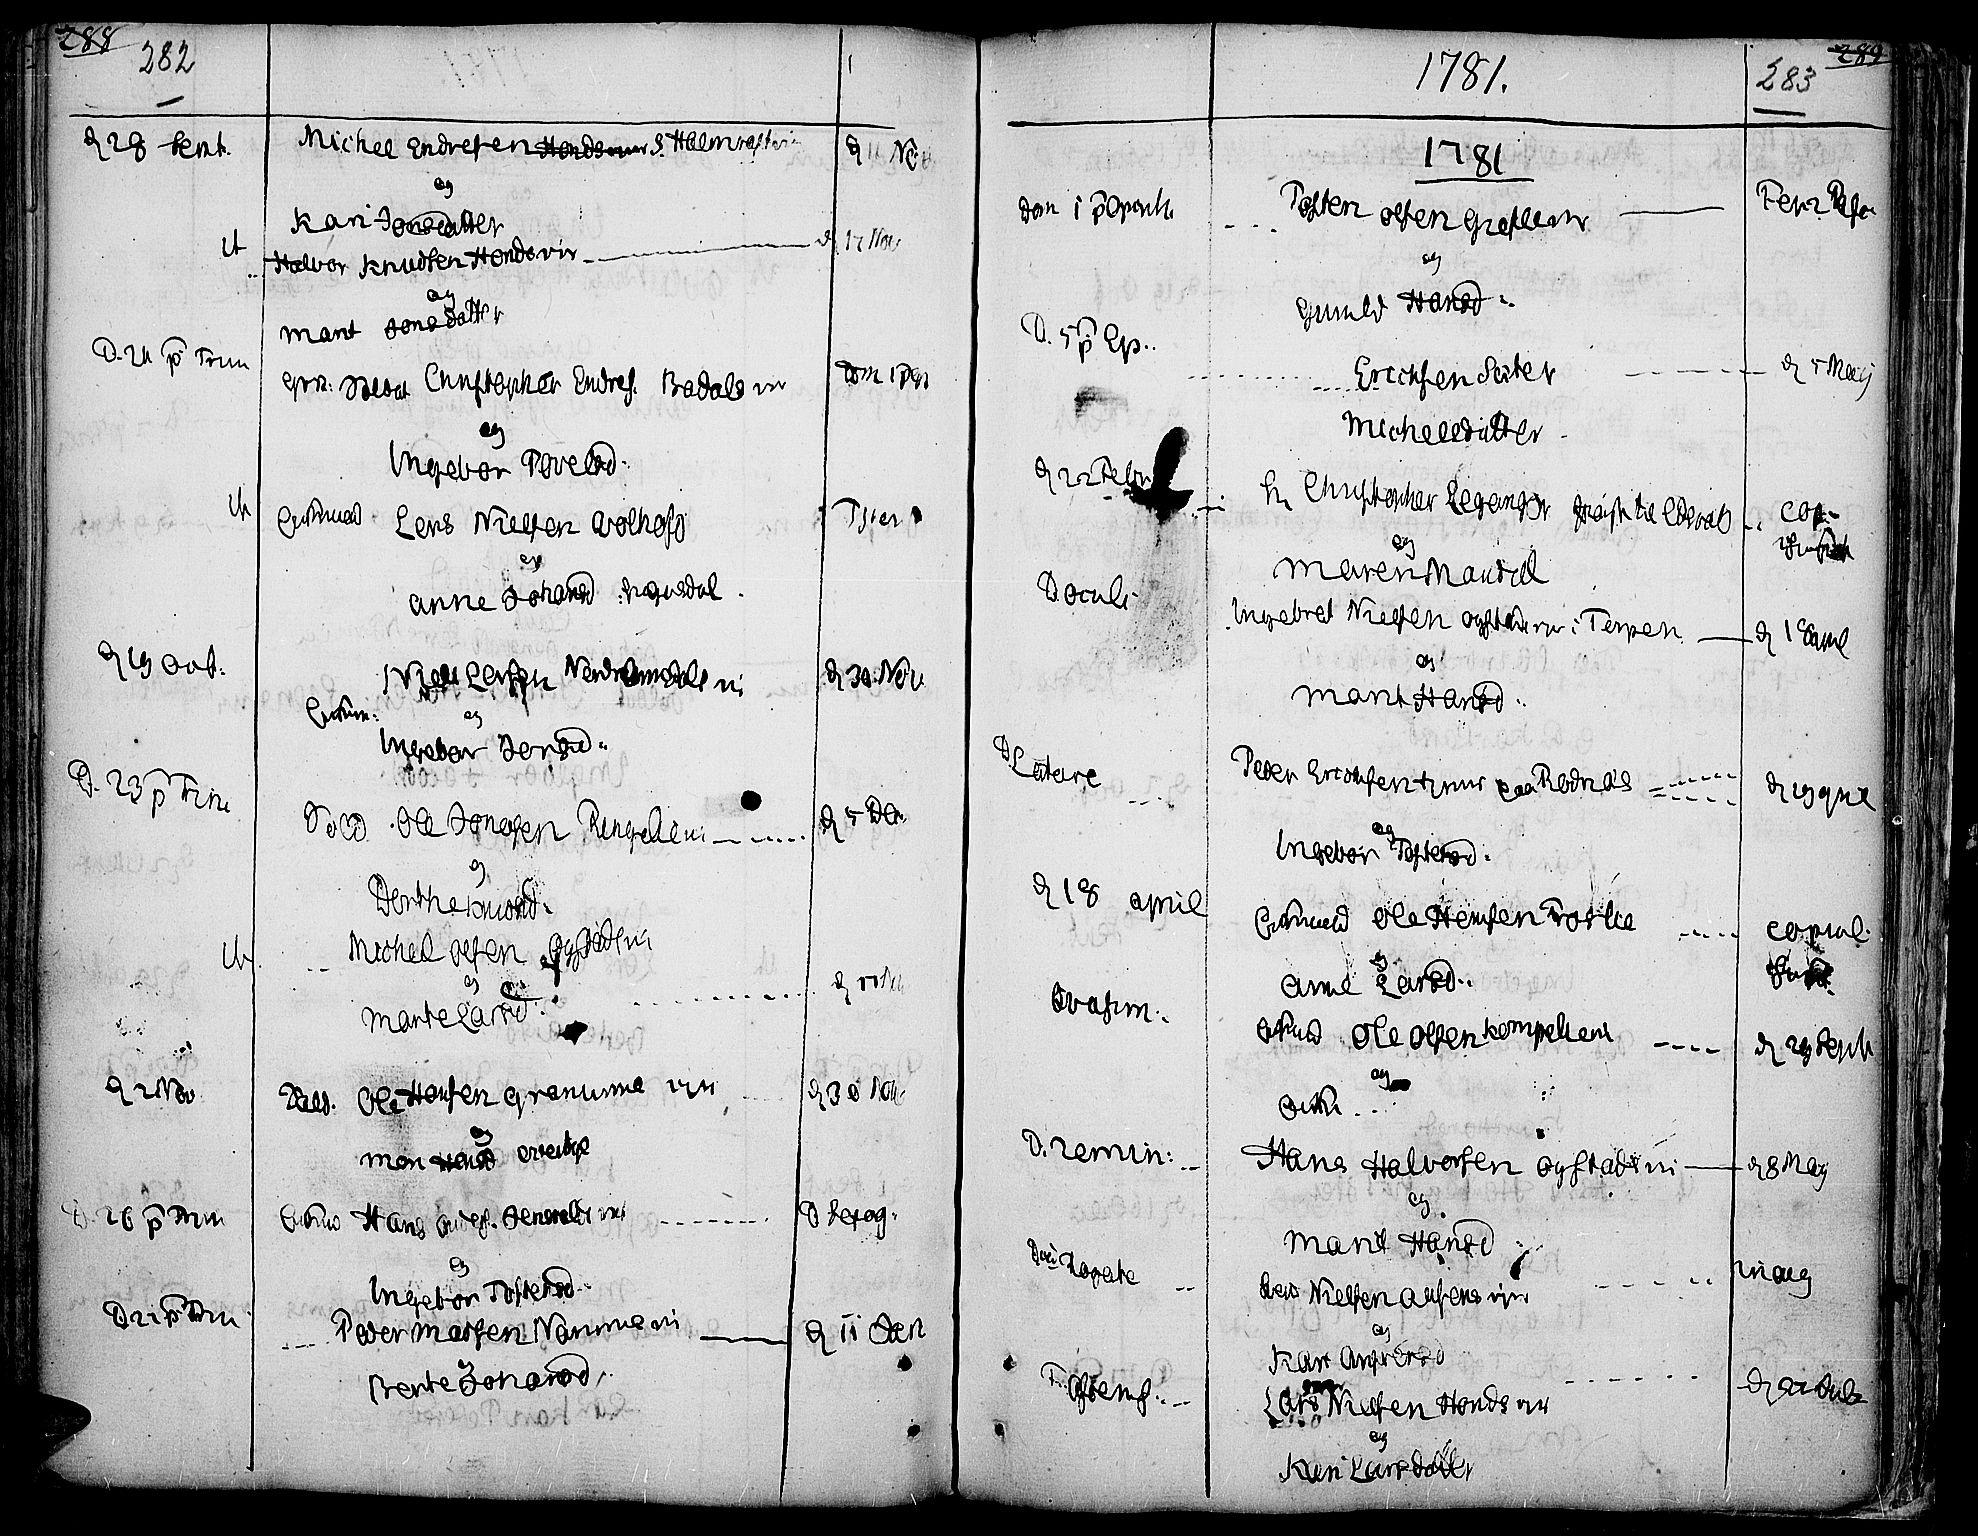 SAH, Land prestekontor, Ministerialbok nr. 5, 1765-1784, s. 282-283